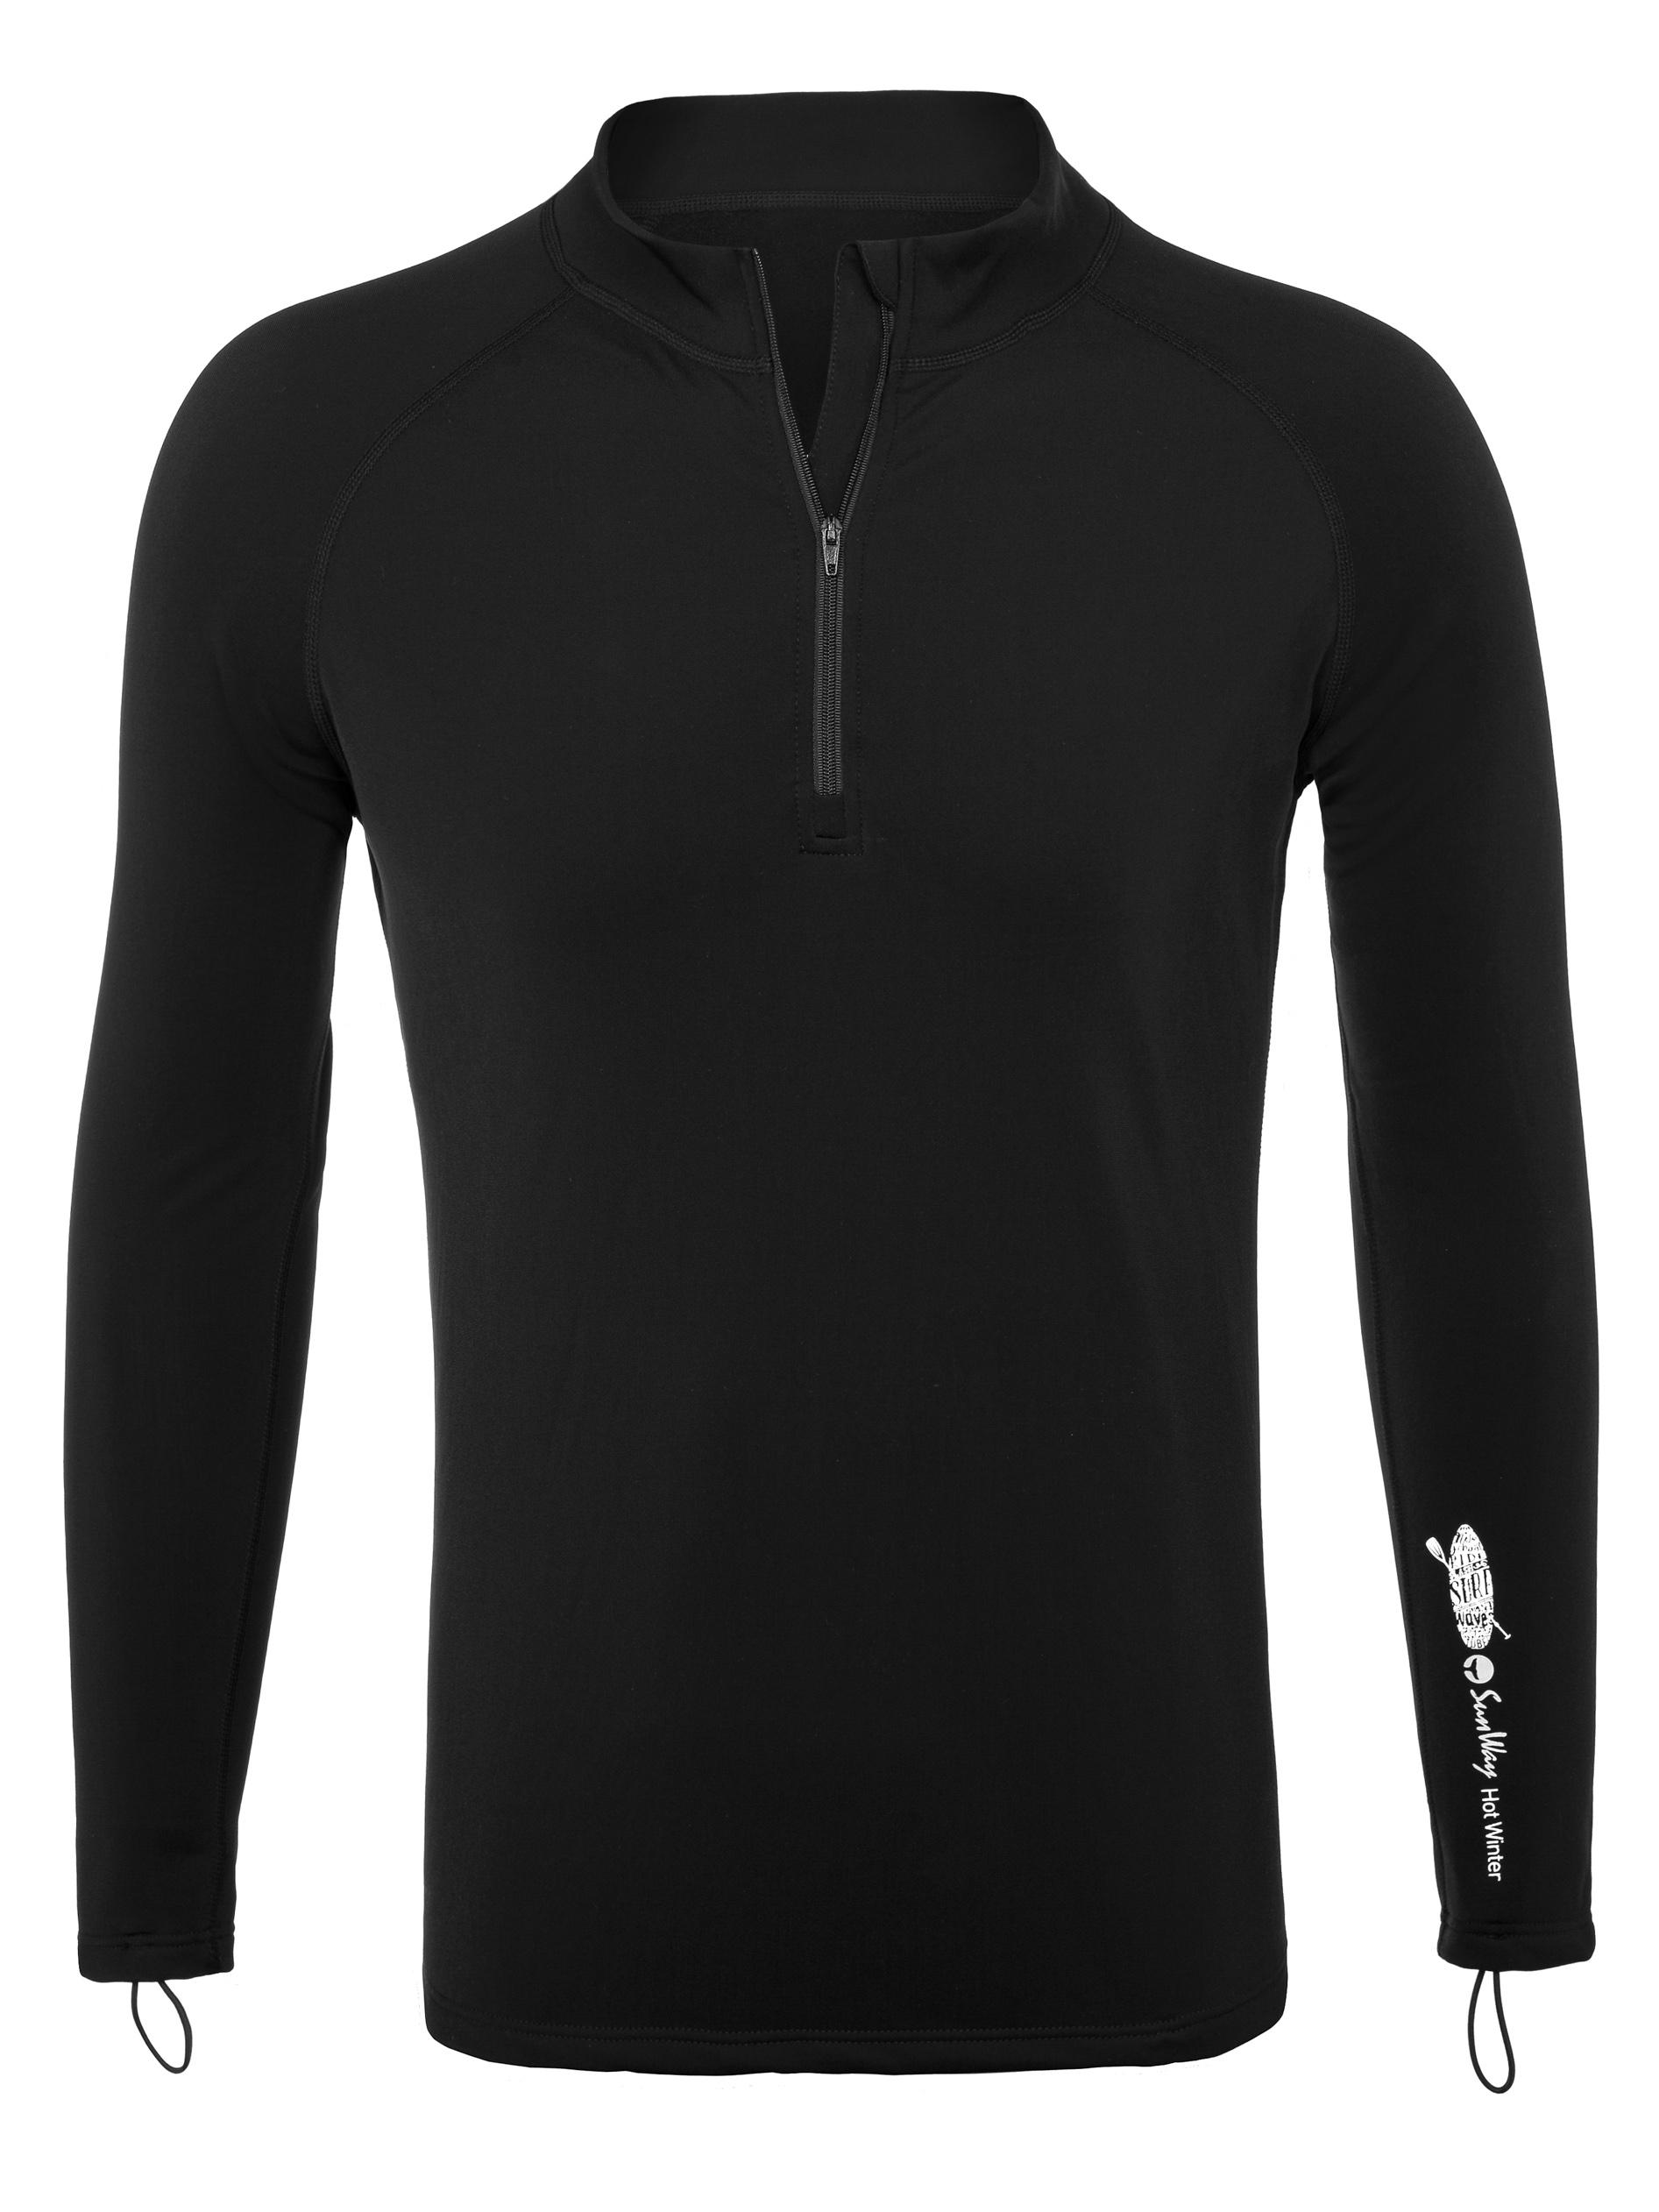 d85a9f7045 Long-Sleeve Rash Guard Shirt with Zipper